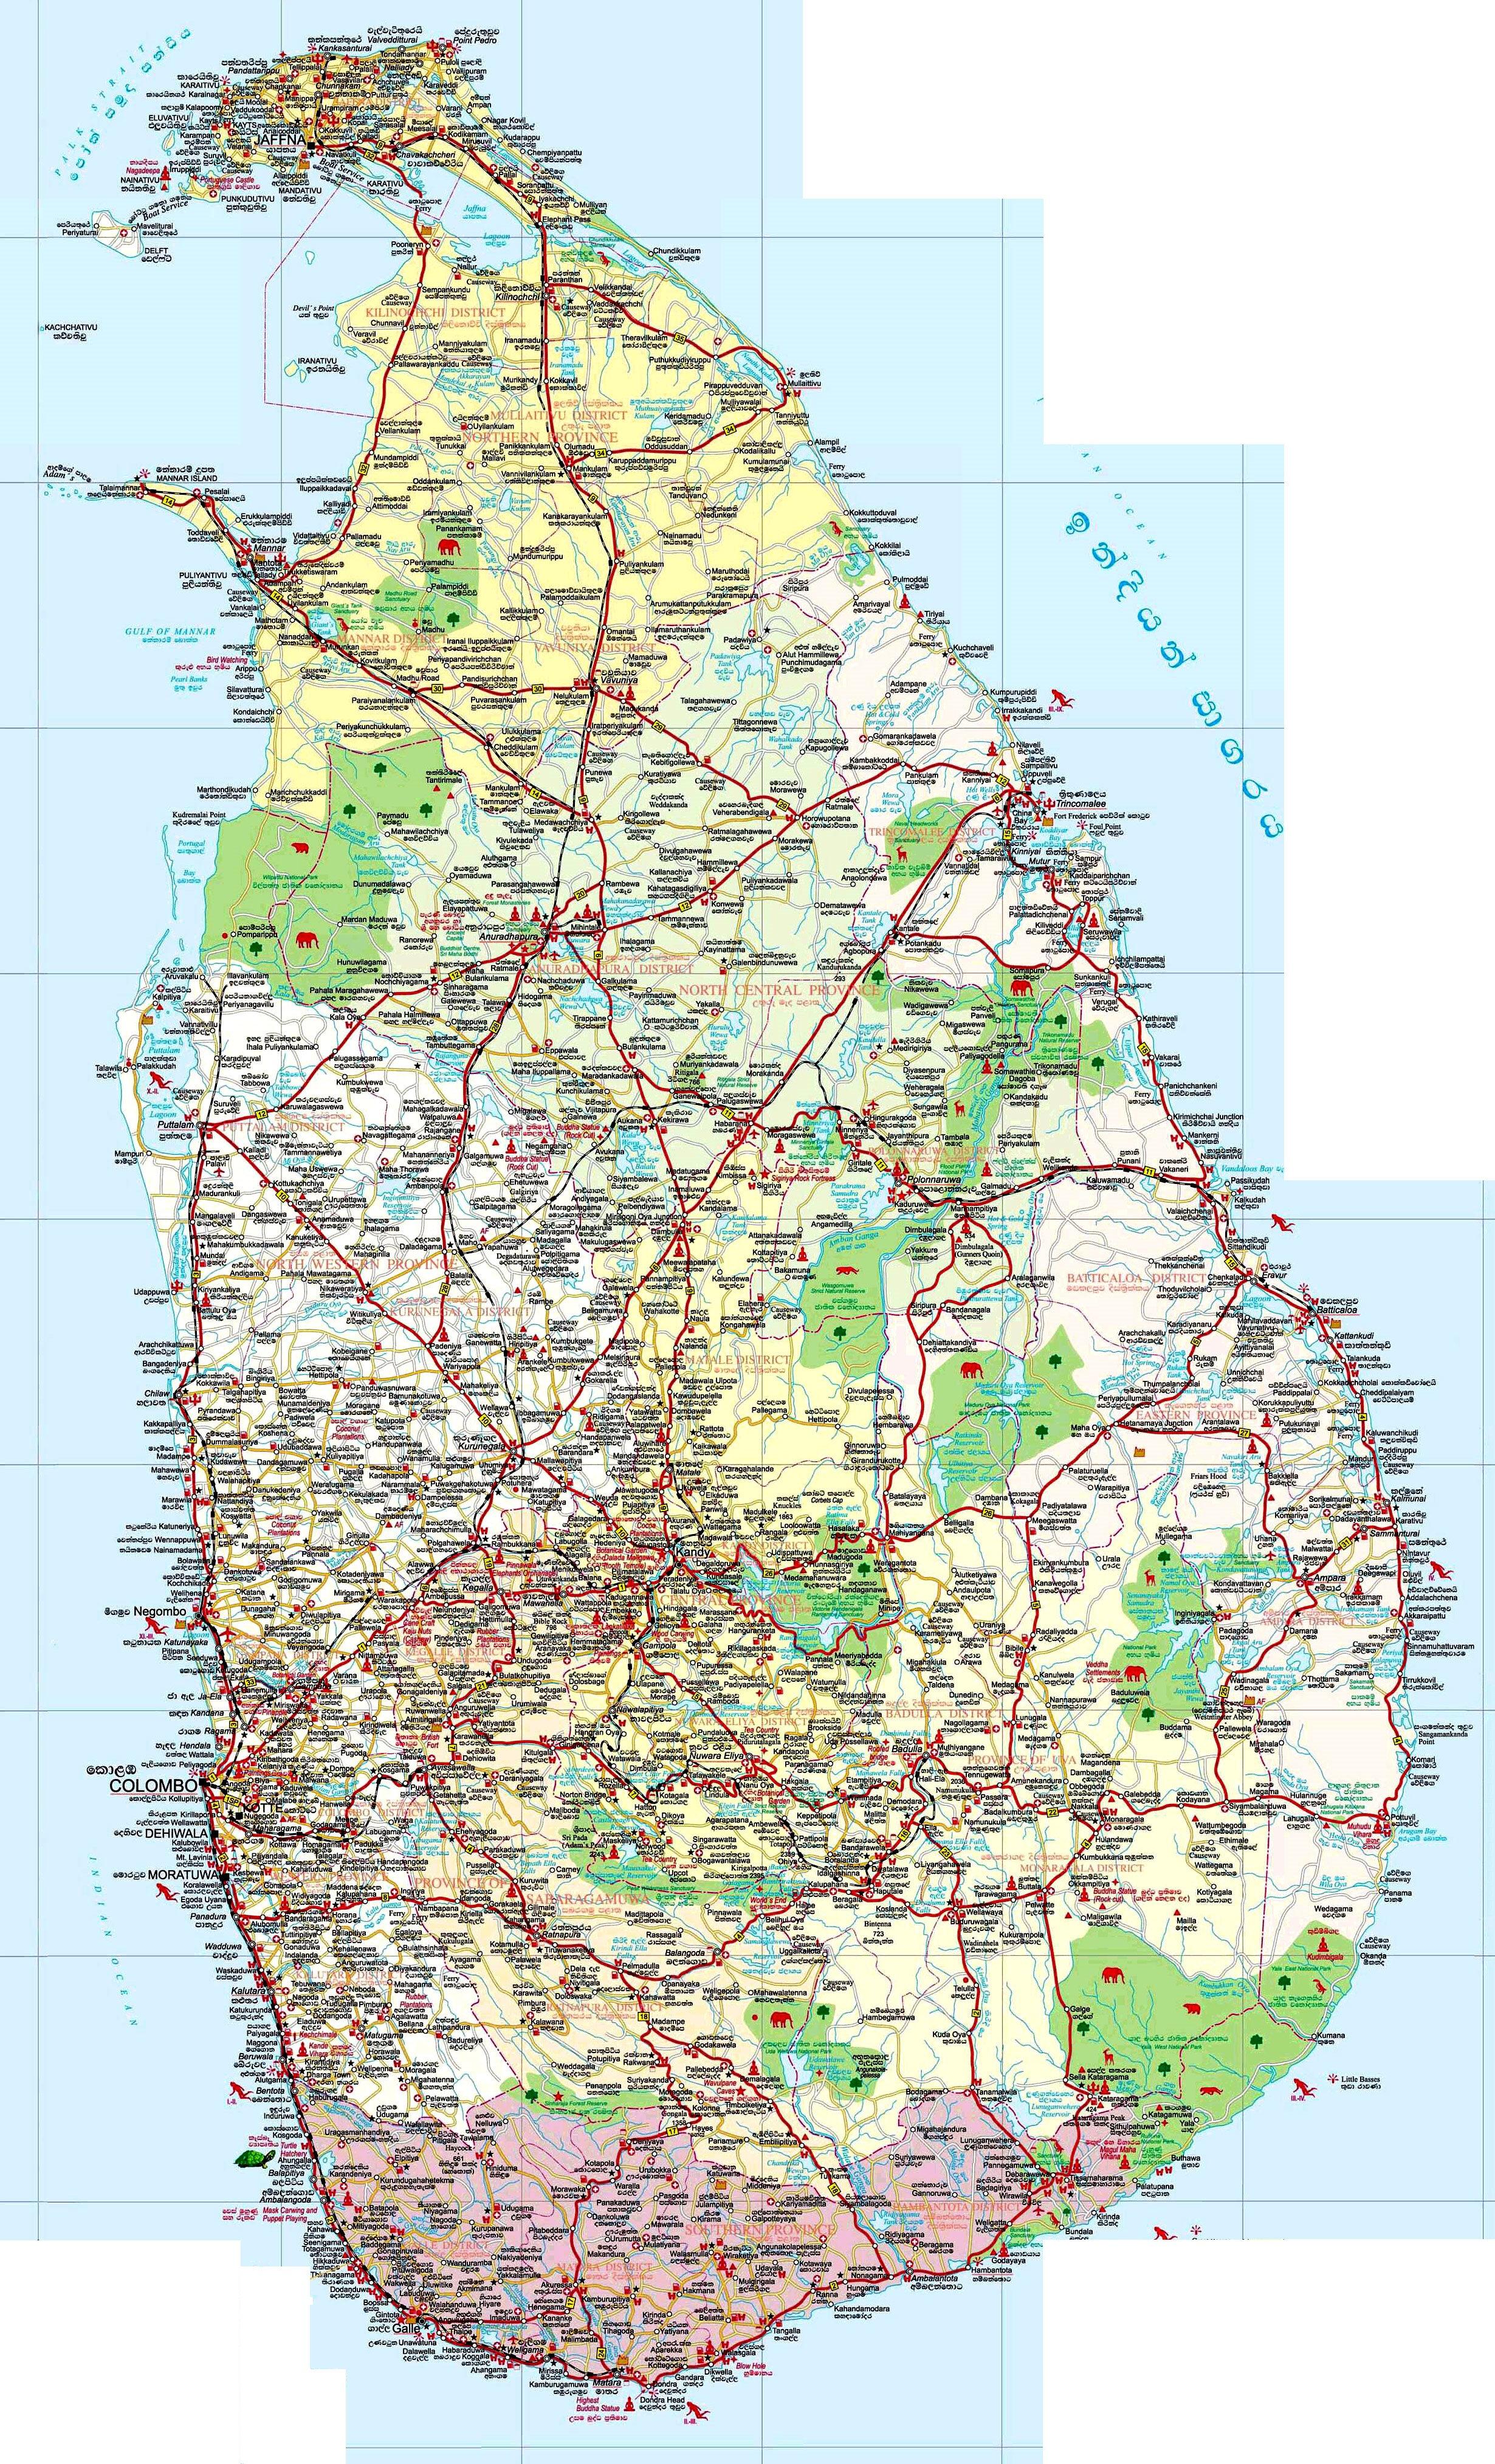 Malediven Karte Weltkarte.Sri Lanka Karte